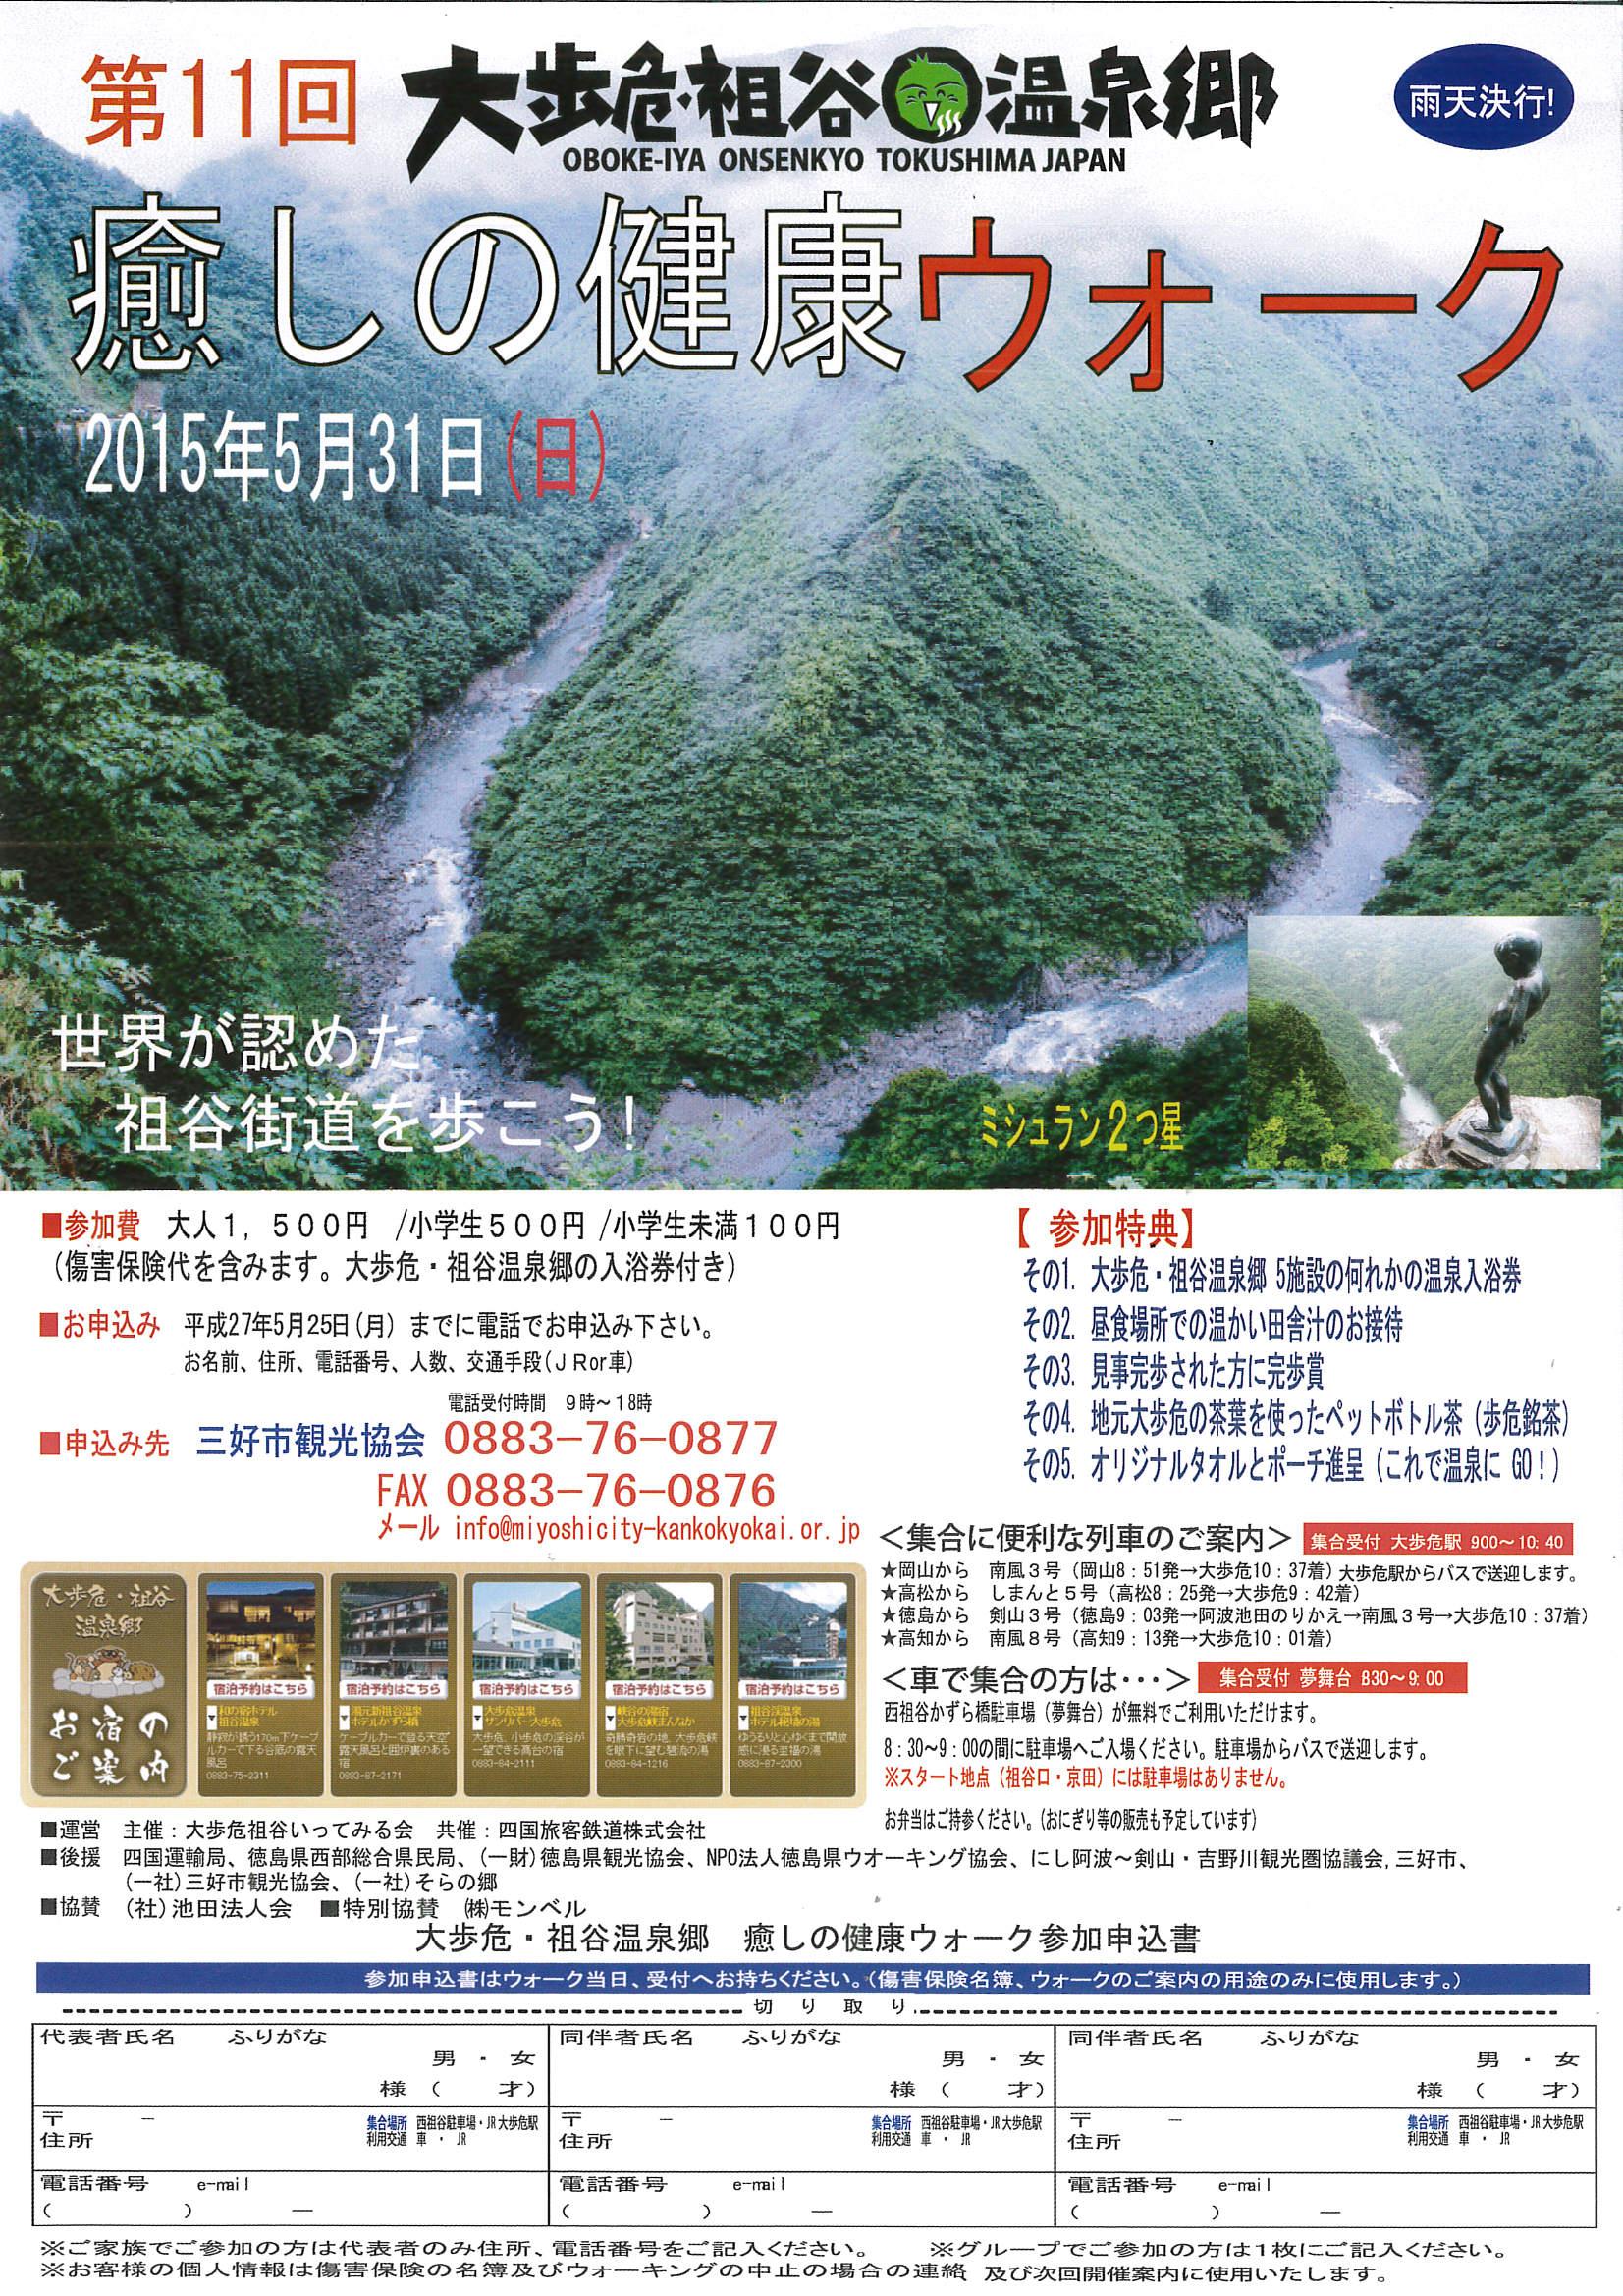 https://www.oboke-iya.jp/whatsnew/MX-2640FN_20150517_160103_001.jpg